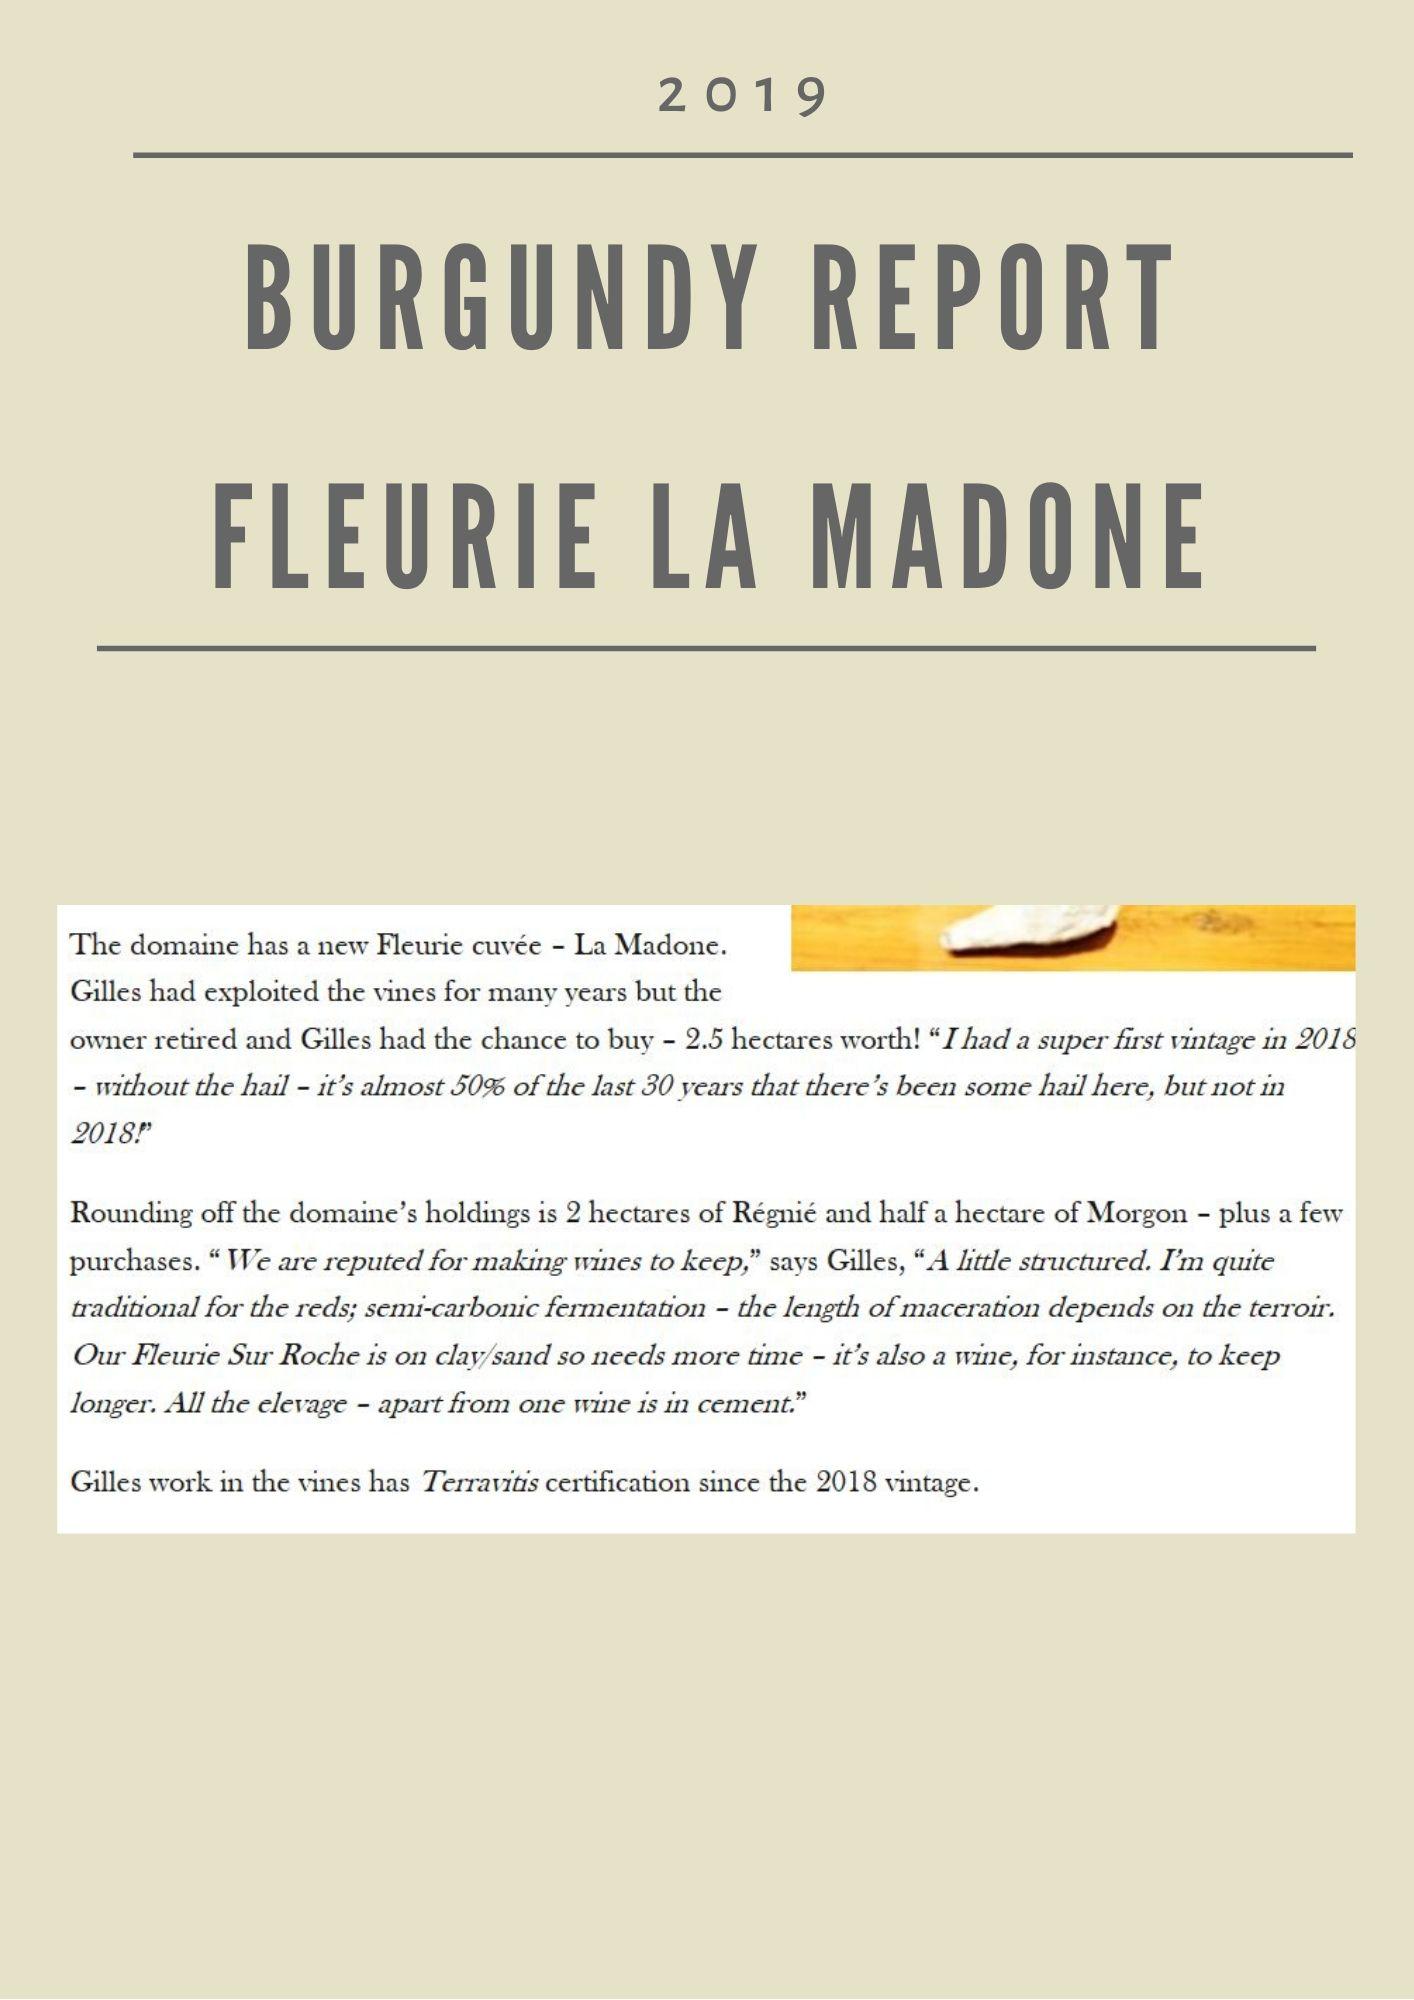 Burgundy Report - Fleurie La Madone